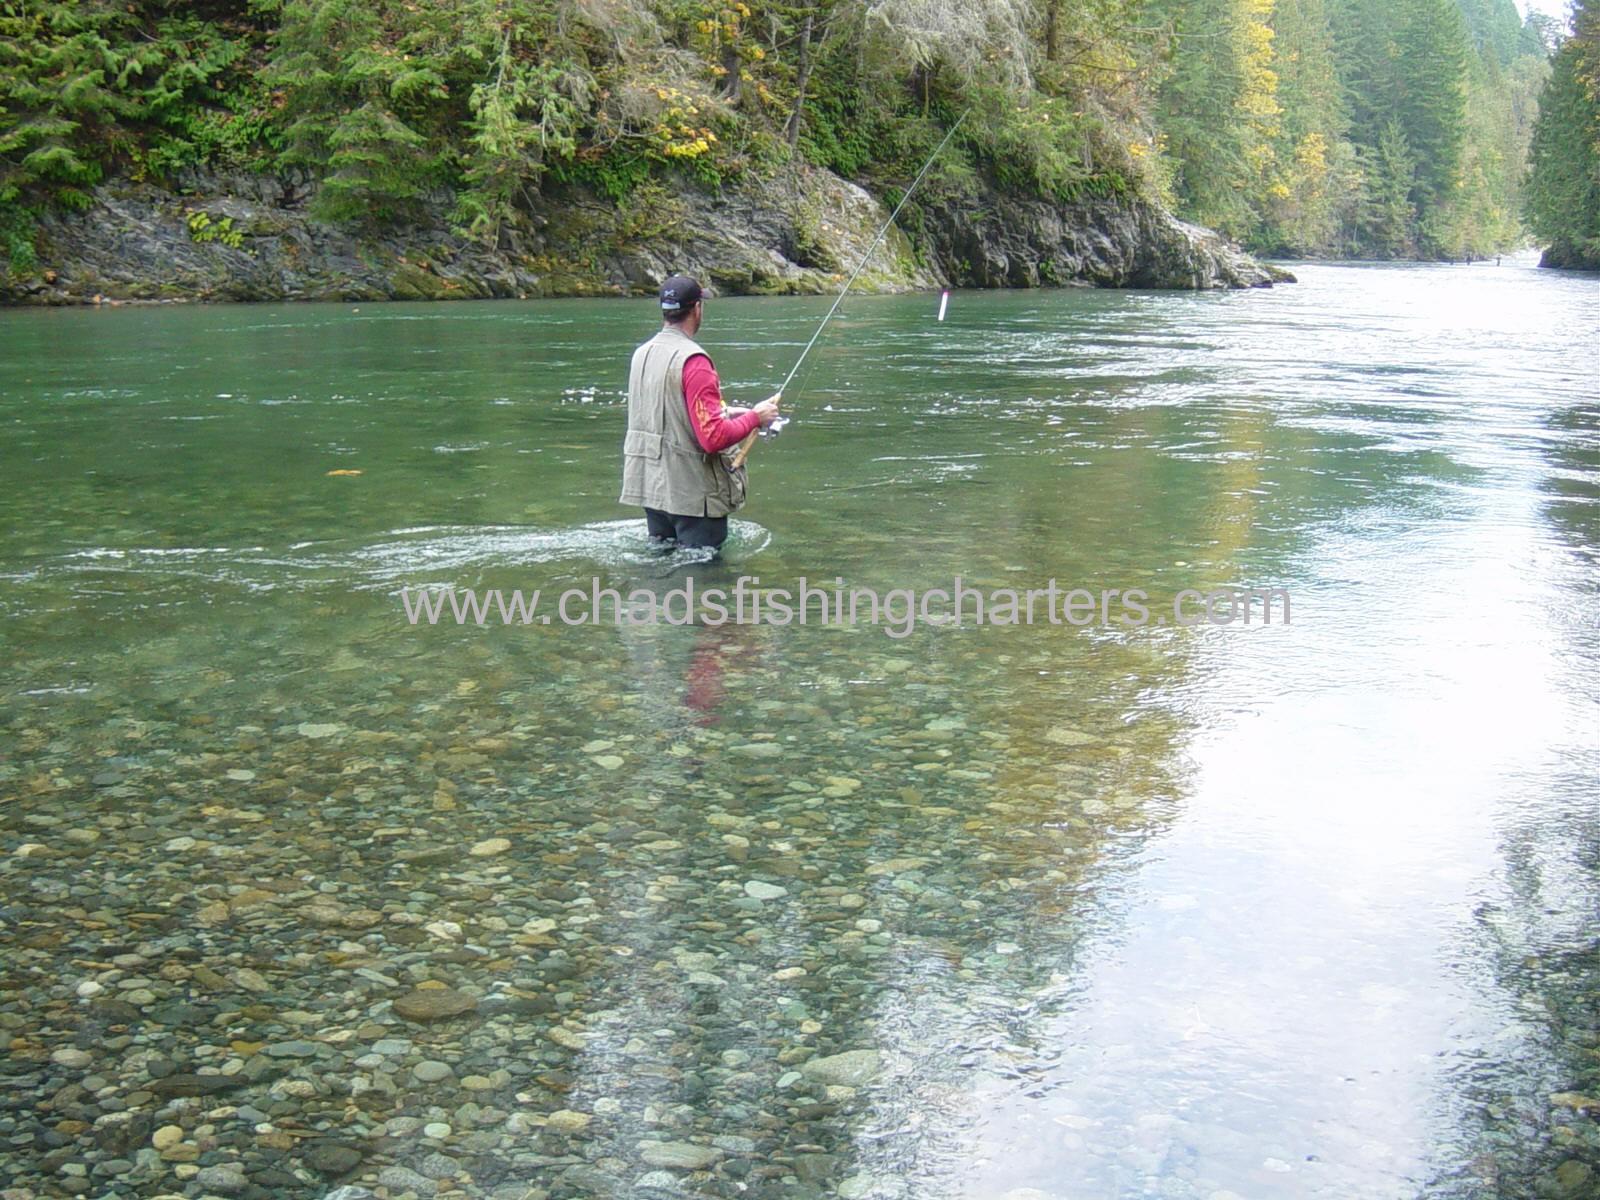 Fraser river fishing guides chilliwack river charters for Fraser river fishing